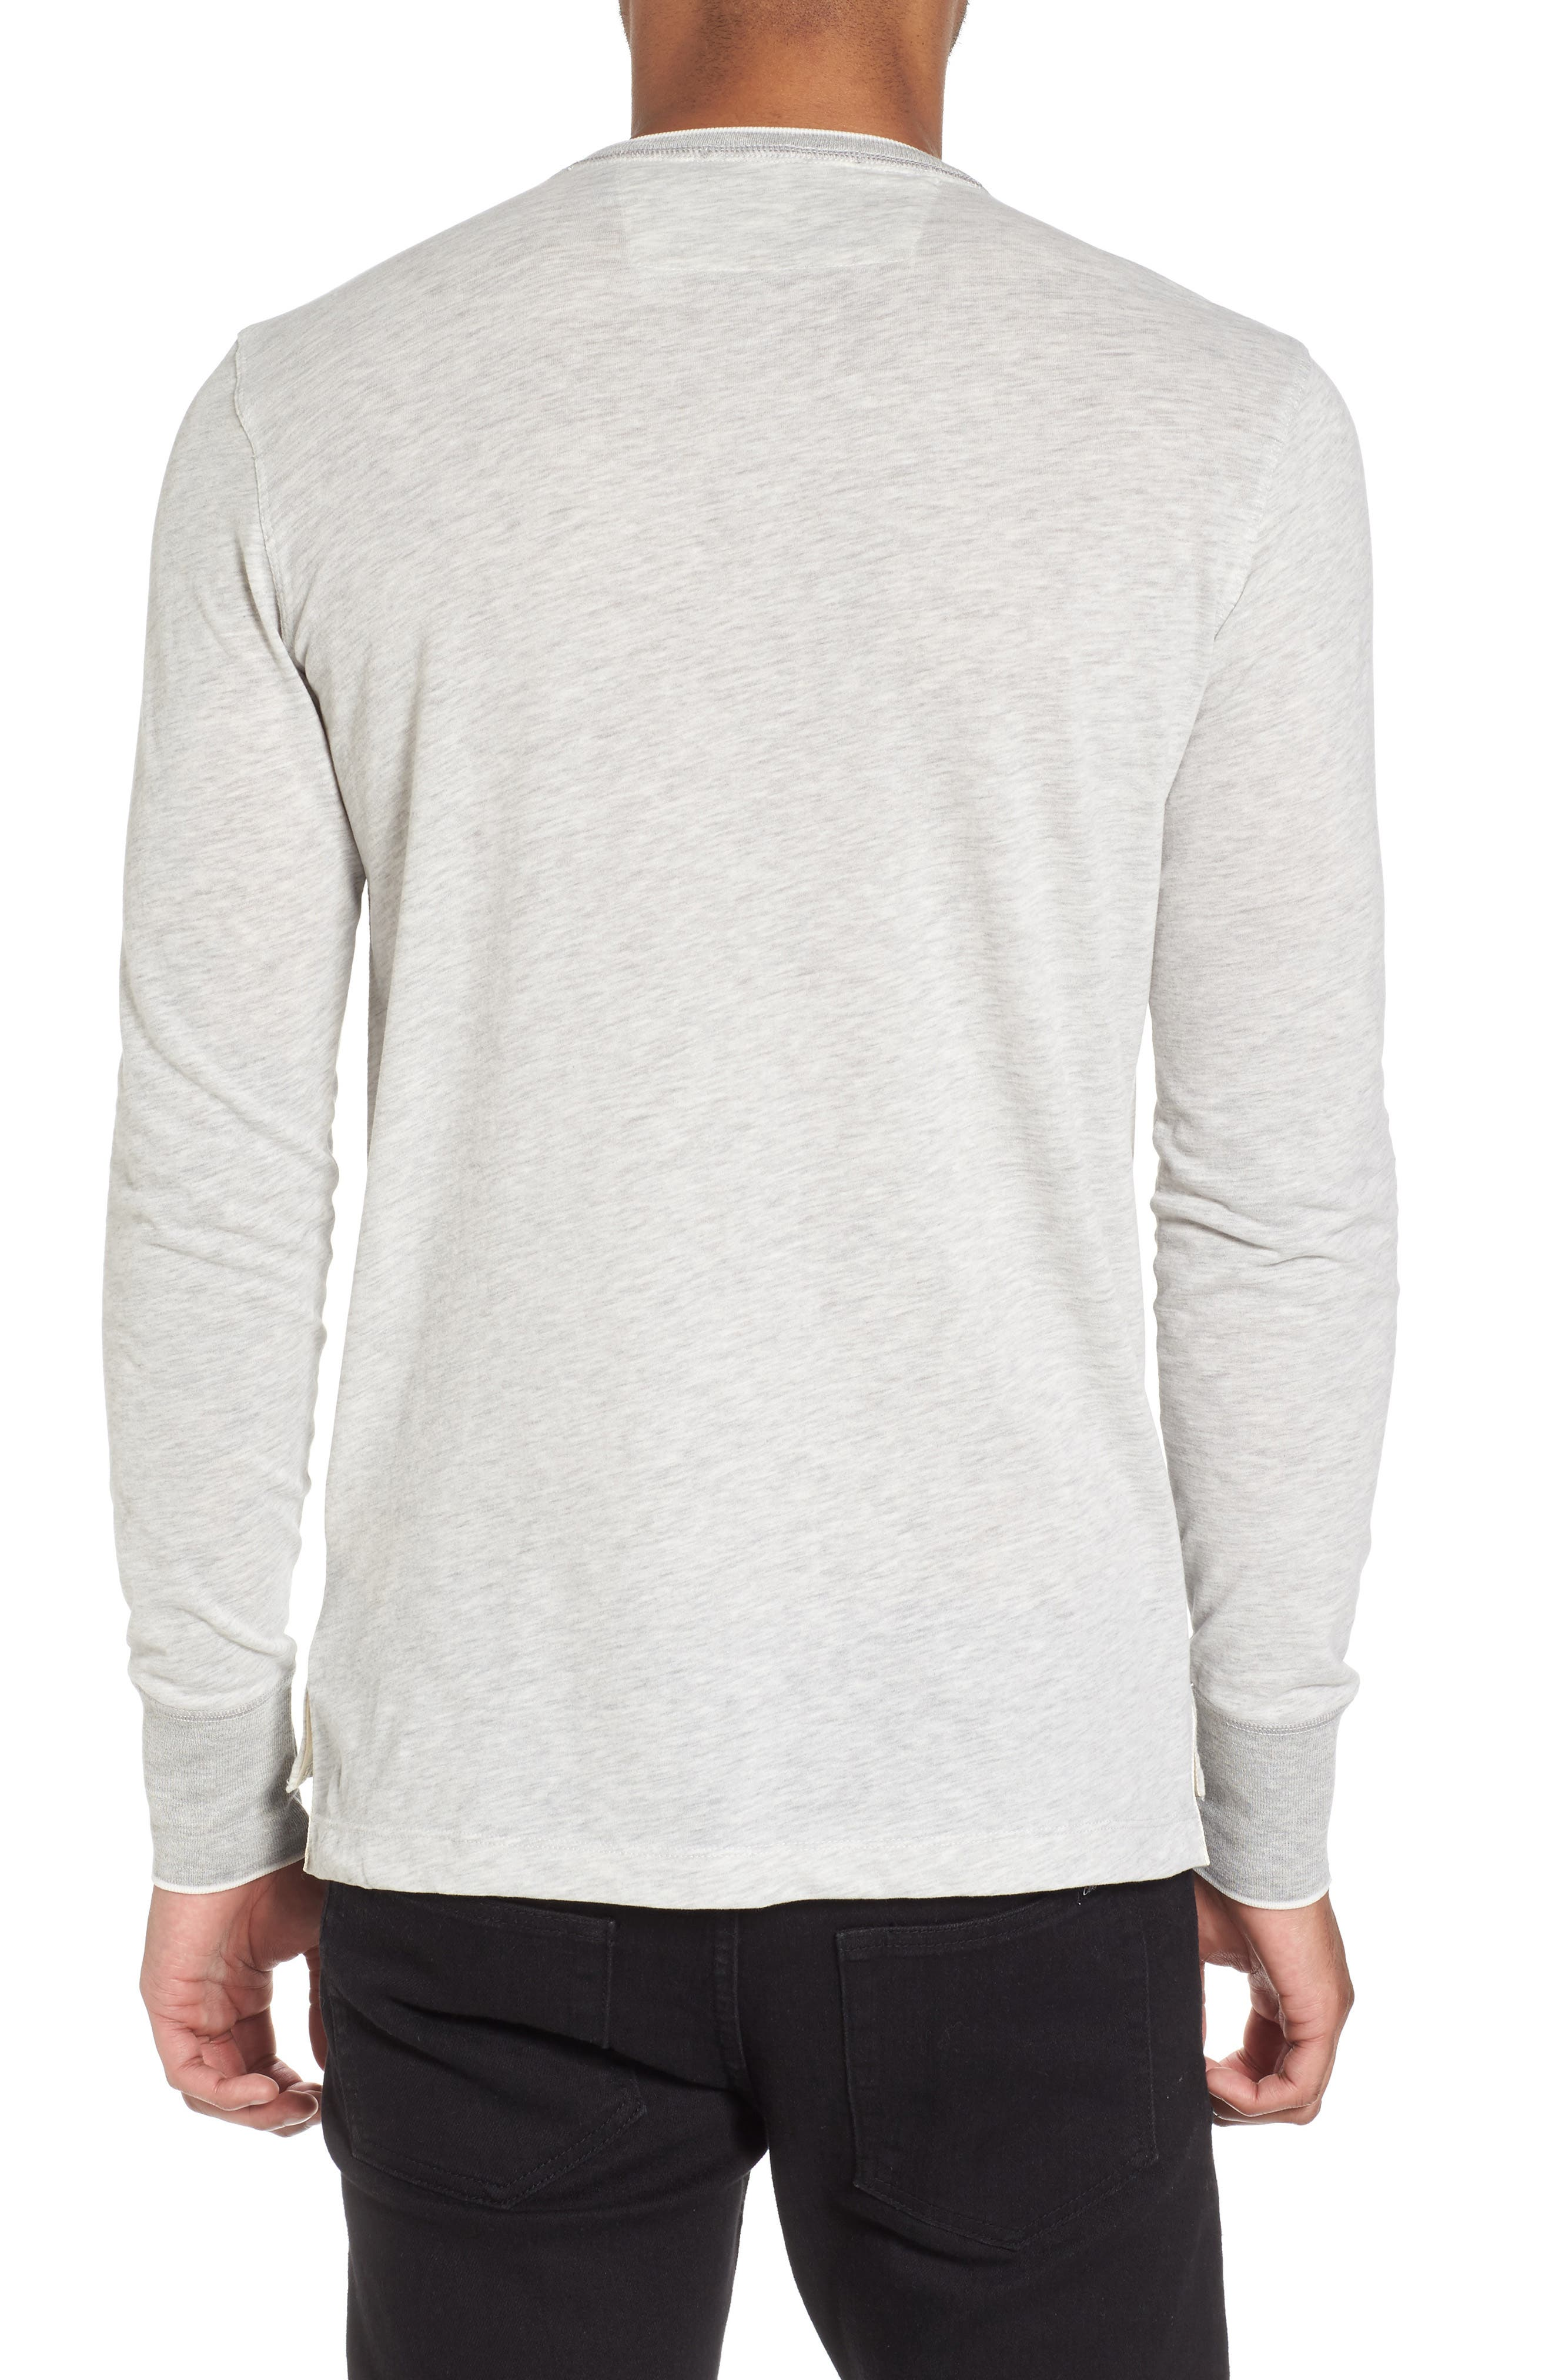 Club Nomade Soft Granddad T-Shirt,                             Alternate thumbnail 2, color,                             020